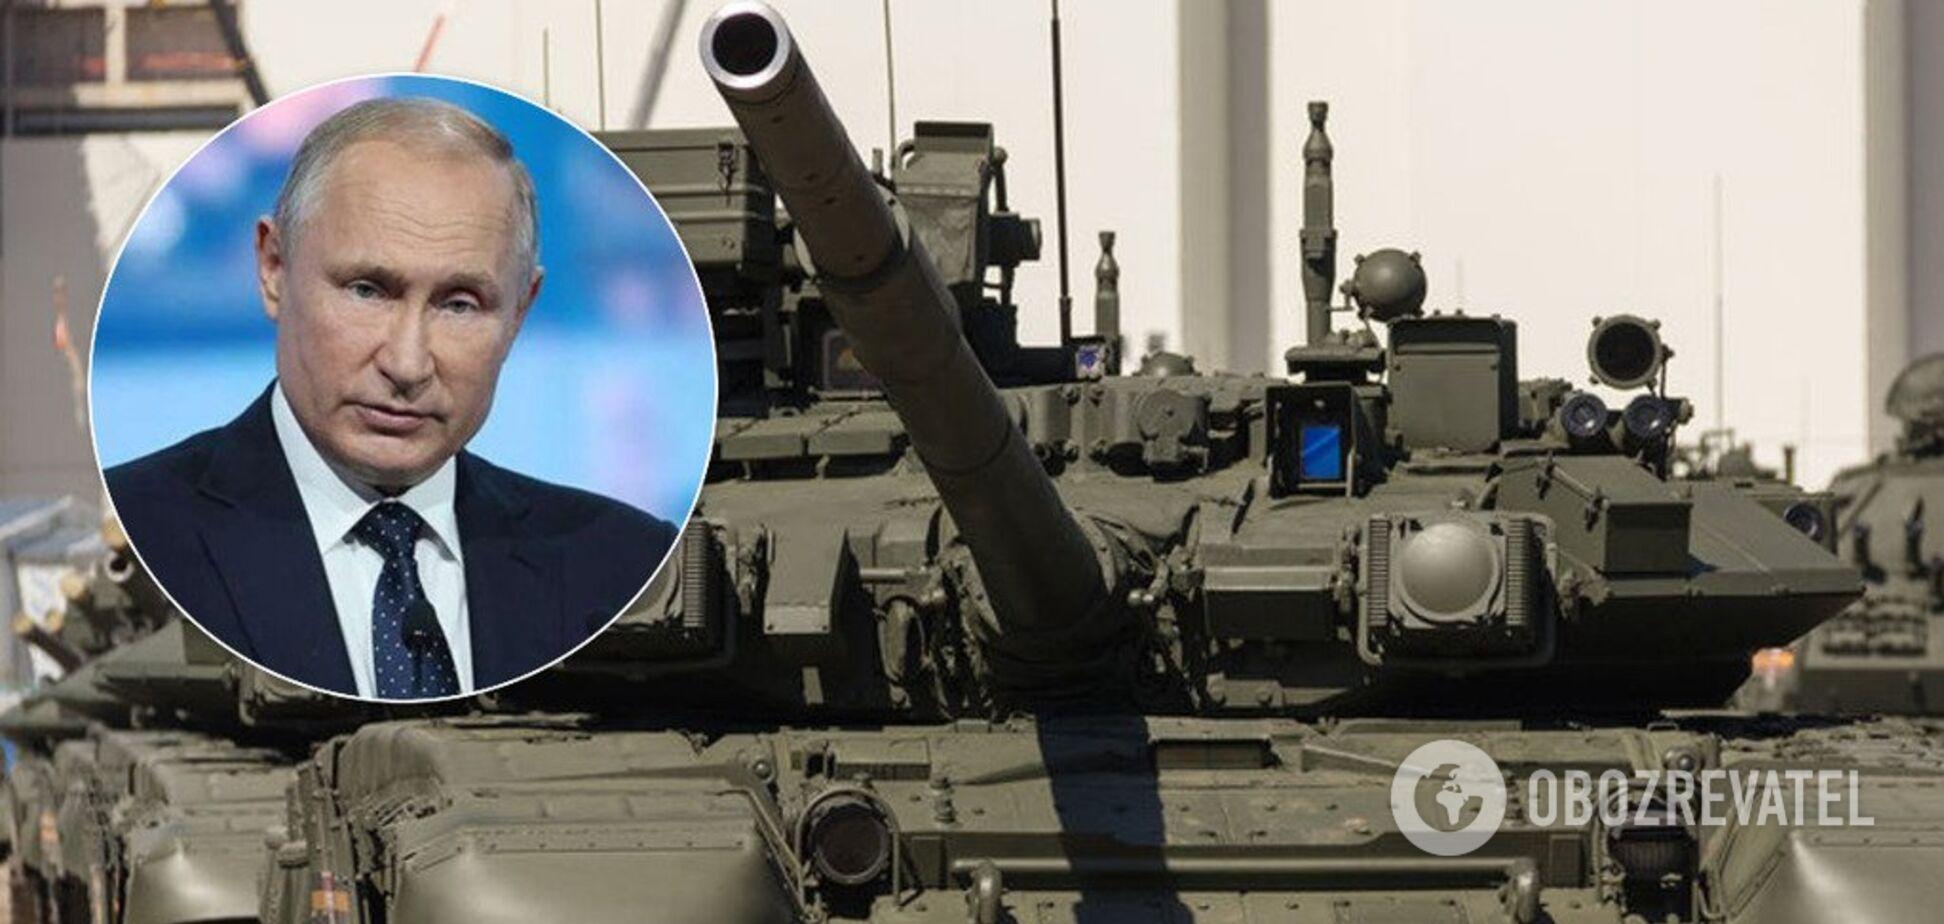 'Путин ударит кулаком по Украине': офицер заявил о новой опасности